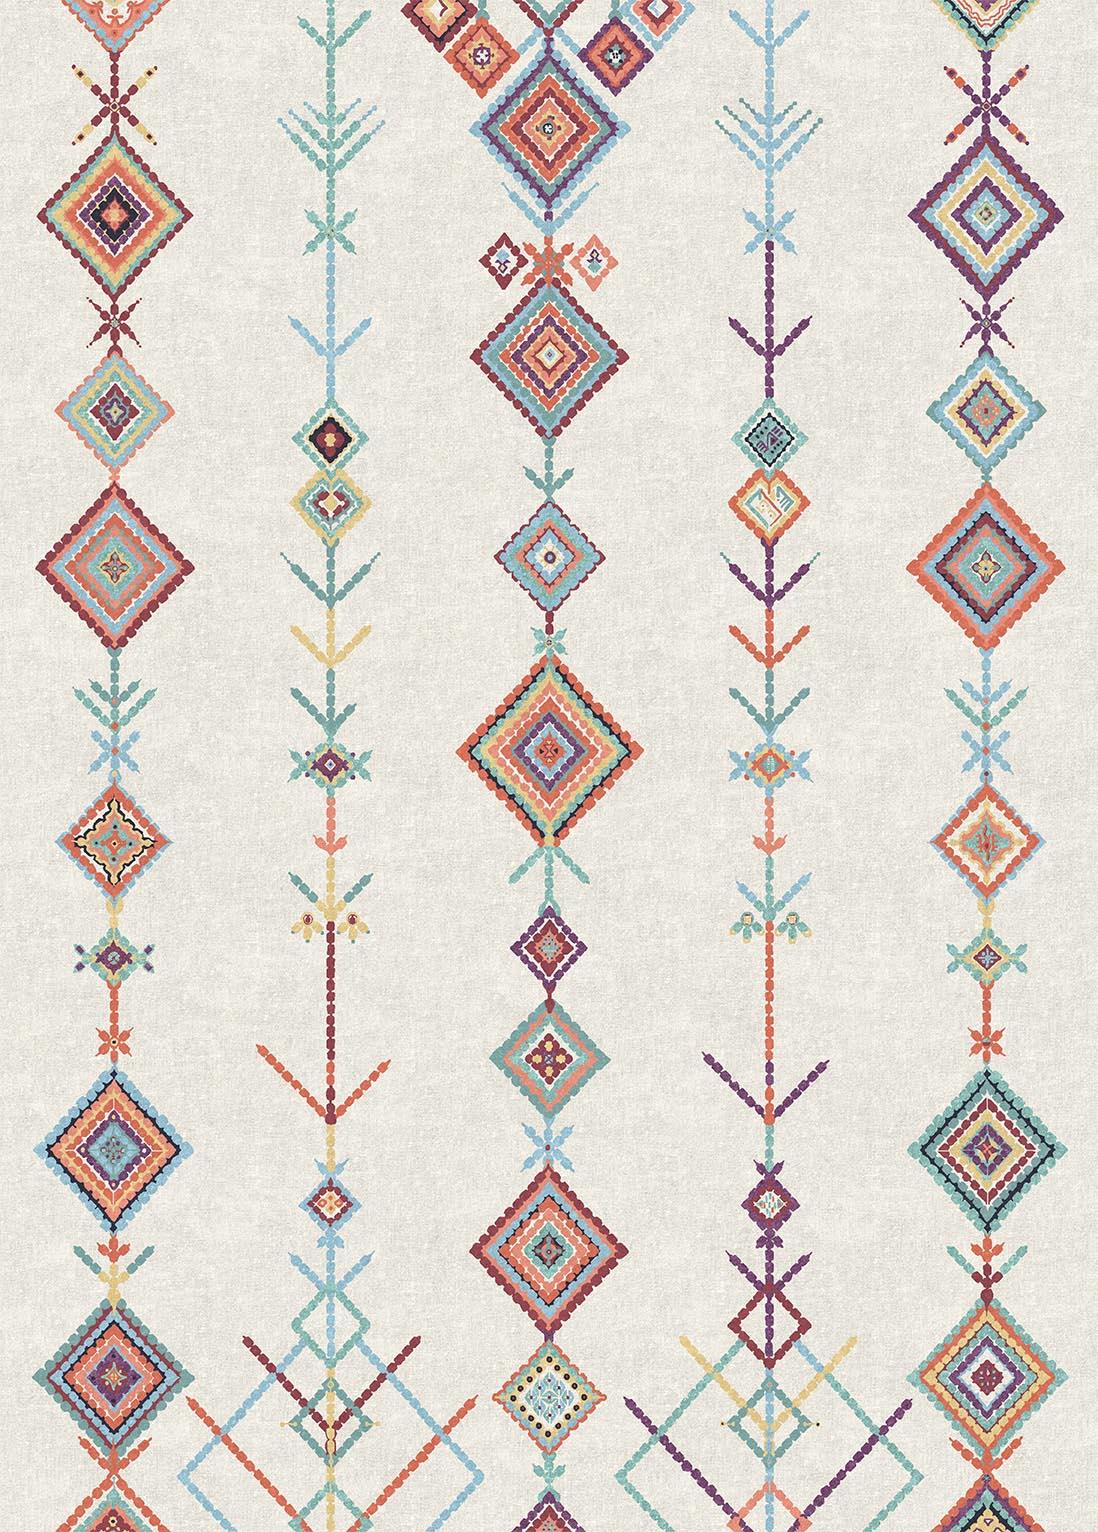 Moroccan Rug - Kenza Polychrome